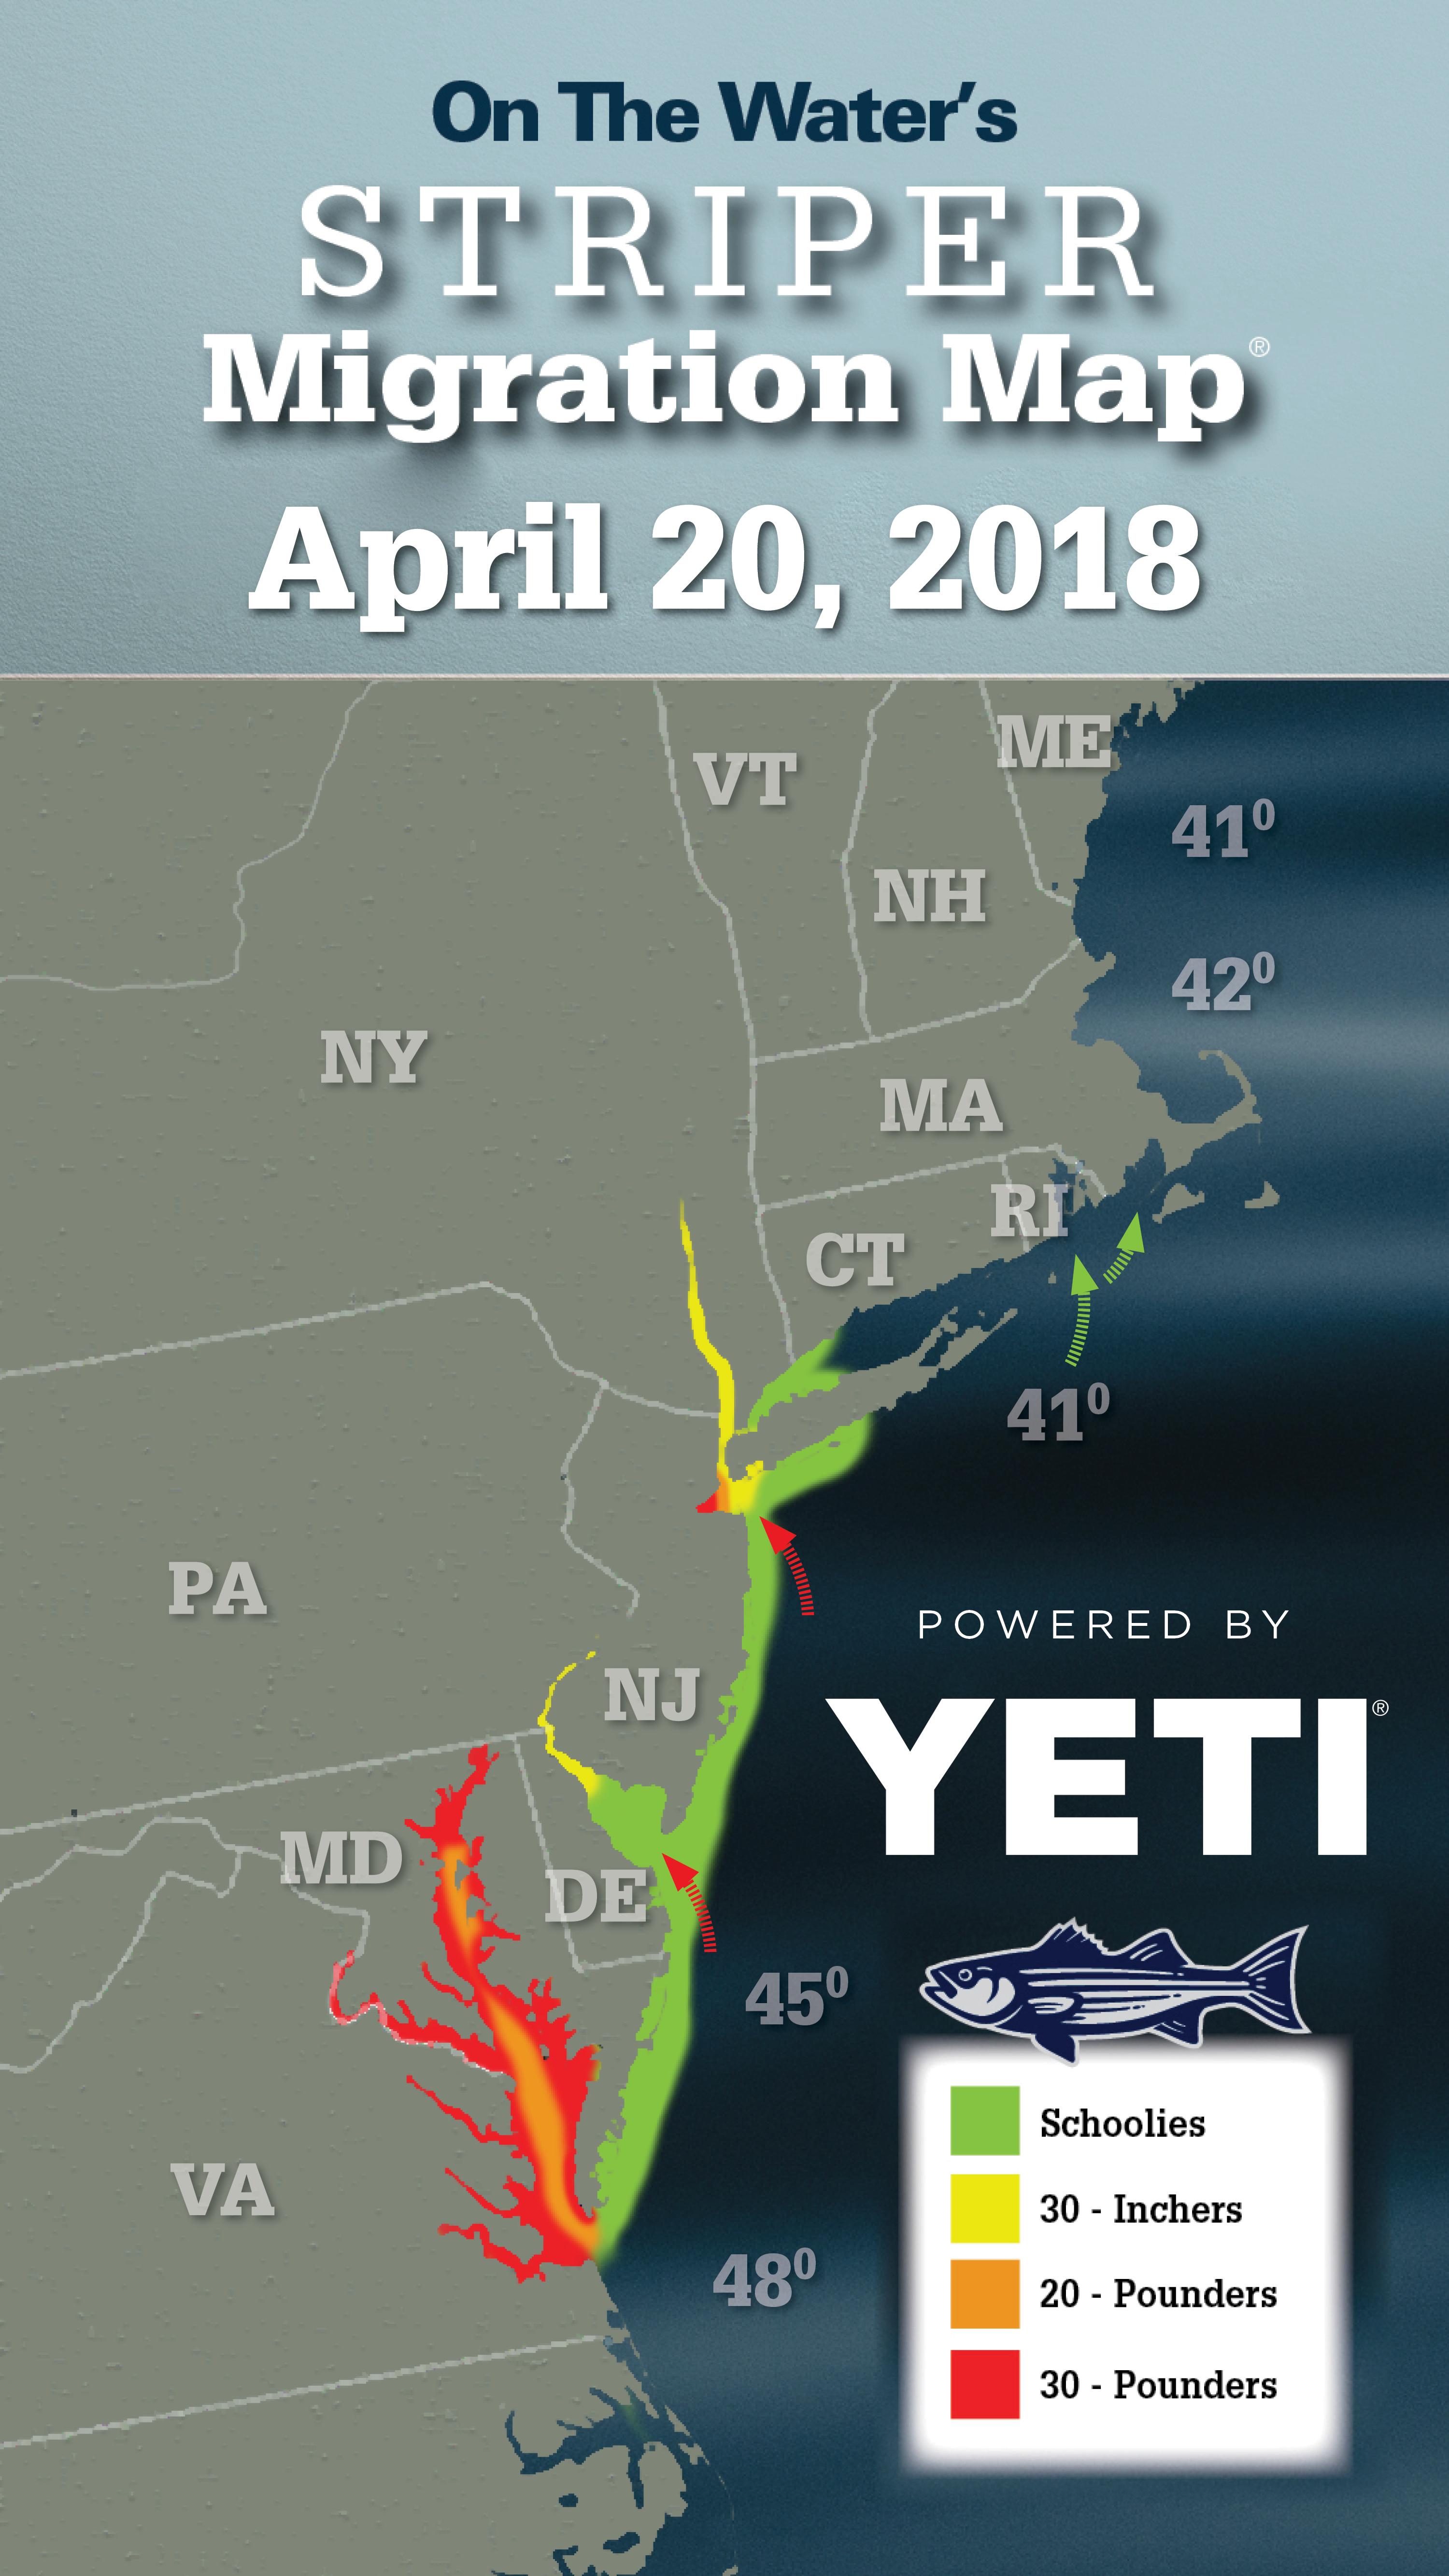 Striper Migration Map April 20